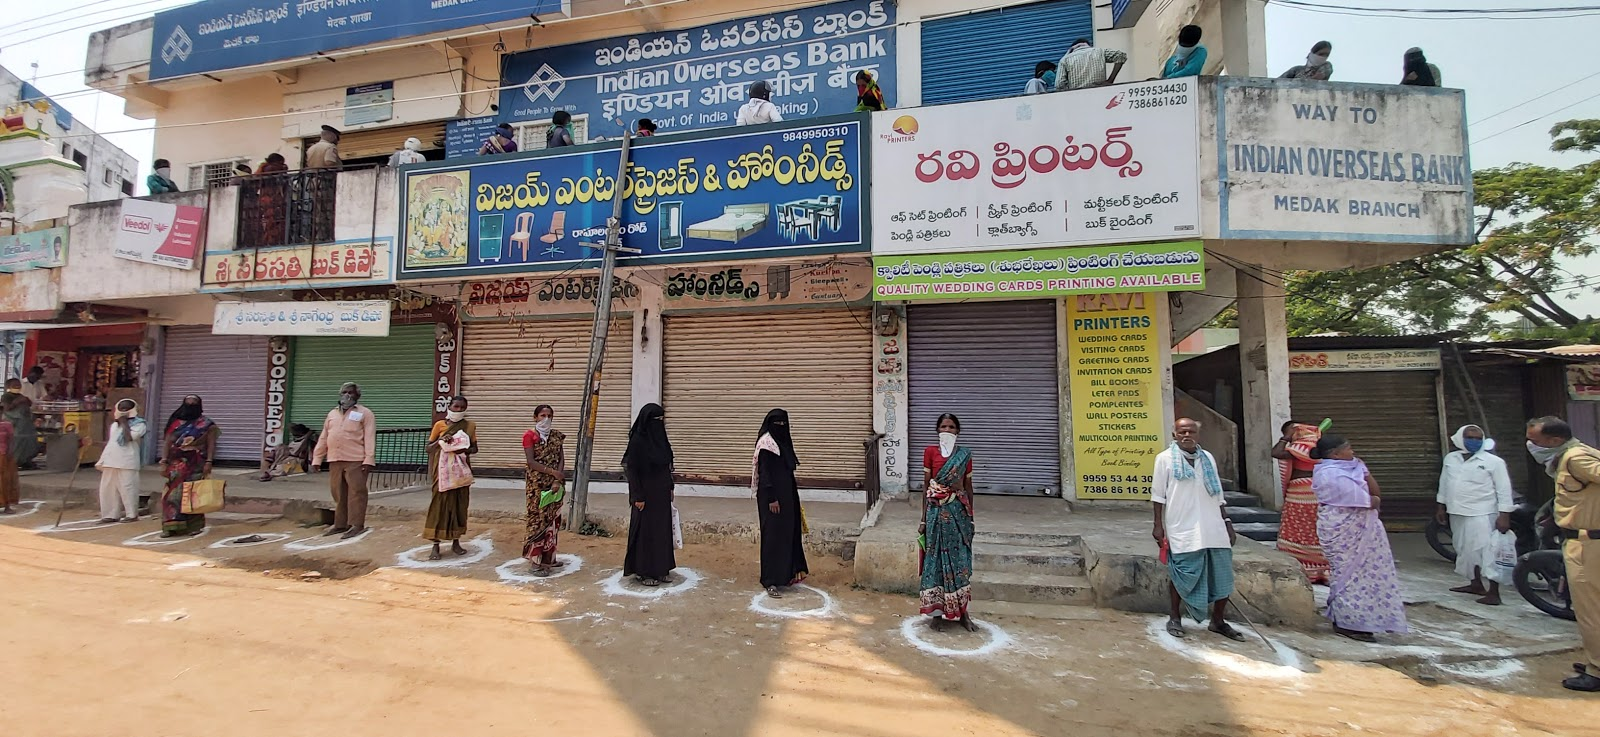 blood bank Indian Overseas Bank near Medak U Telangana